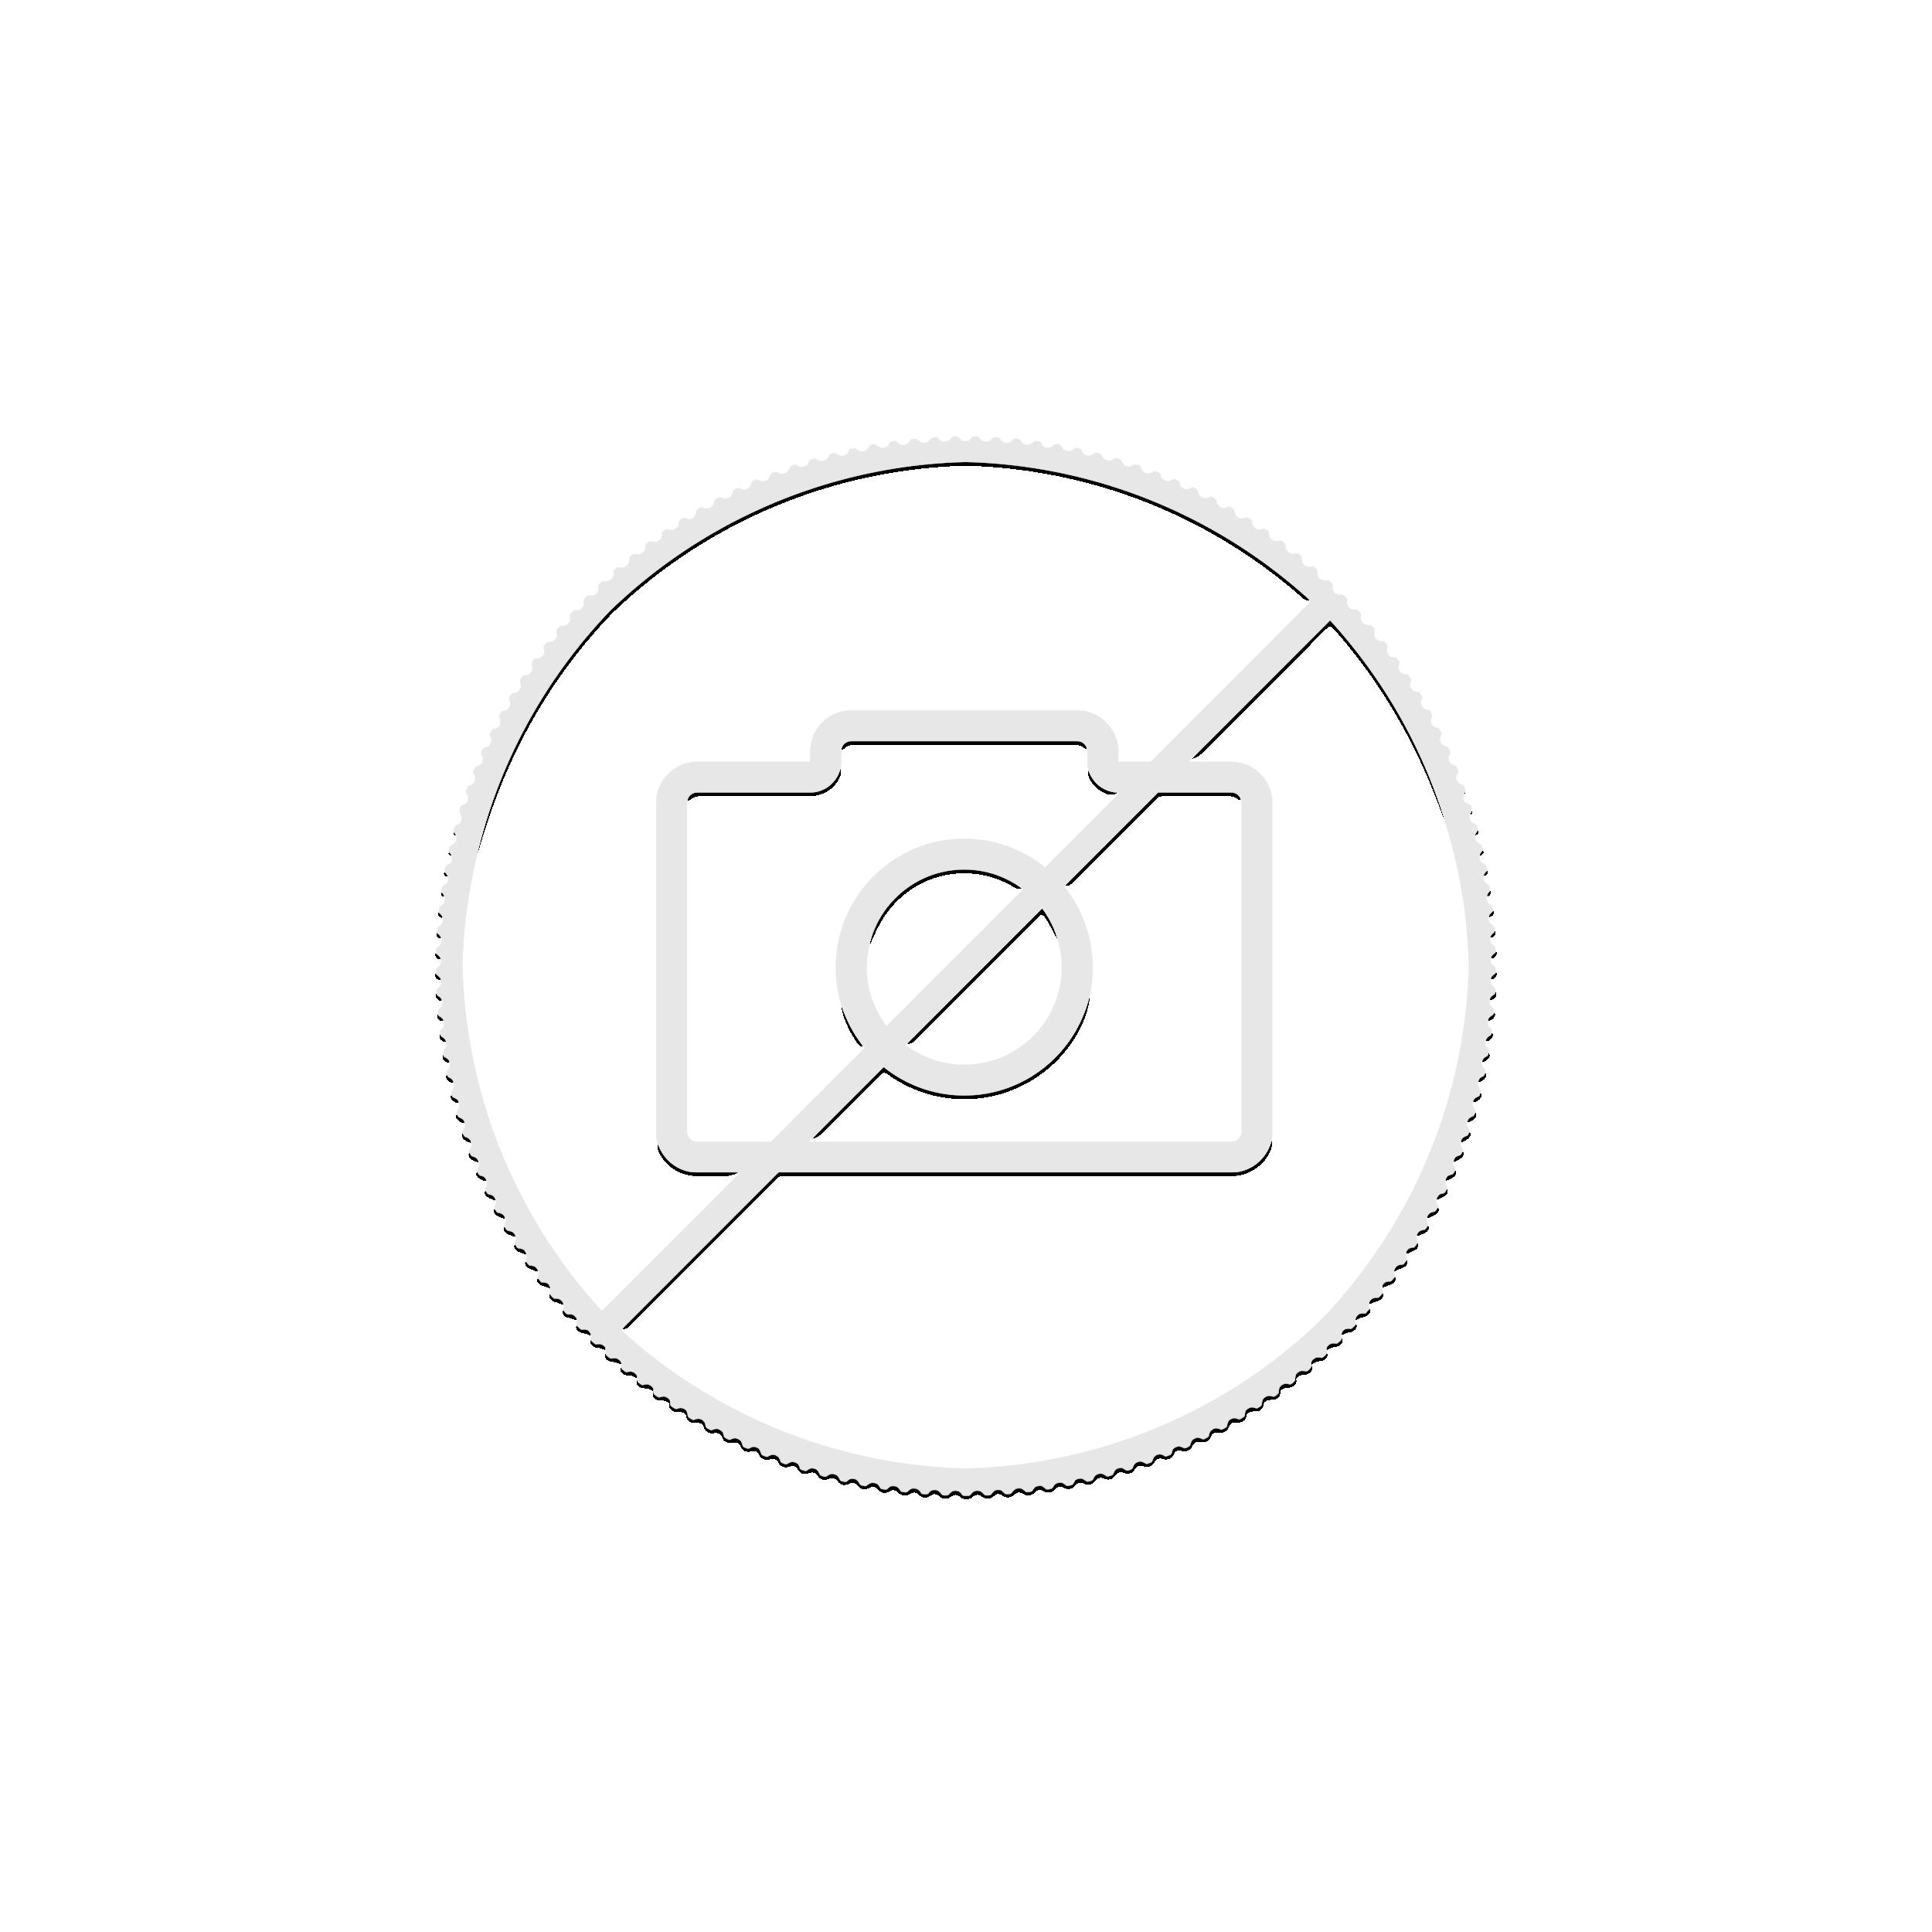 1 troy ounce silver coin Saint-Helena angel 2021 Proof